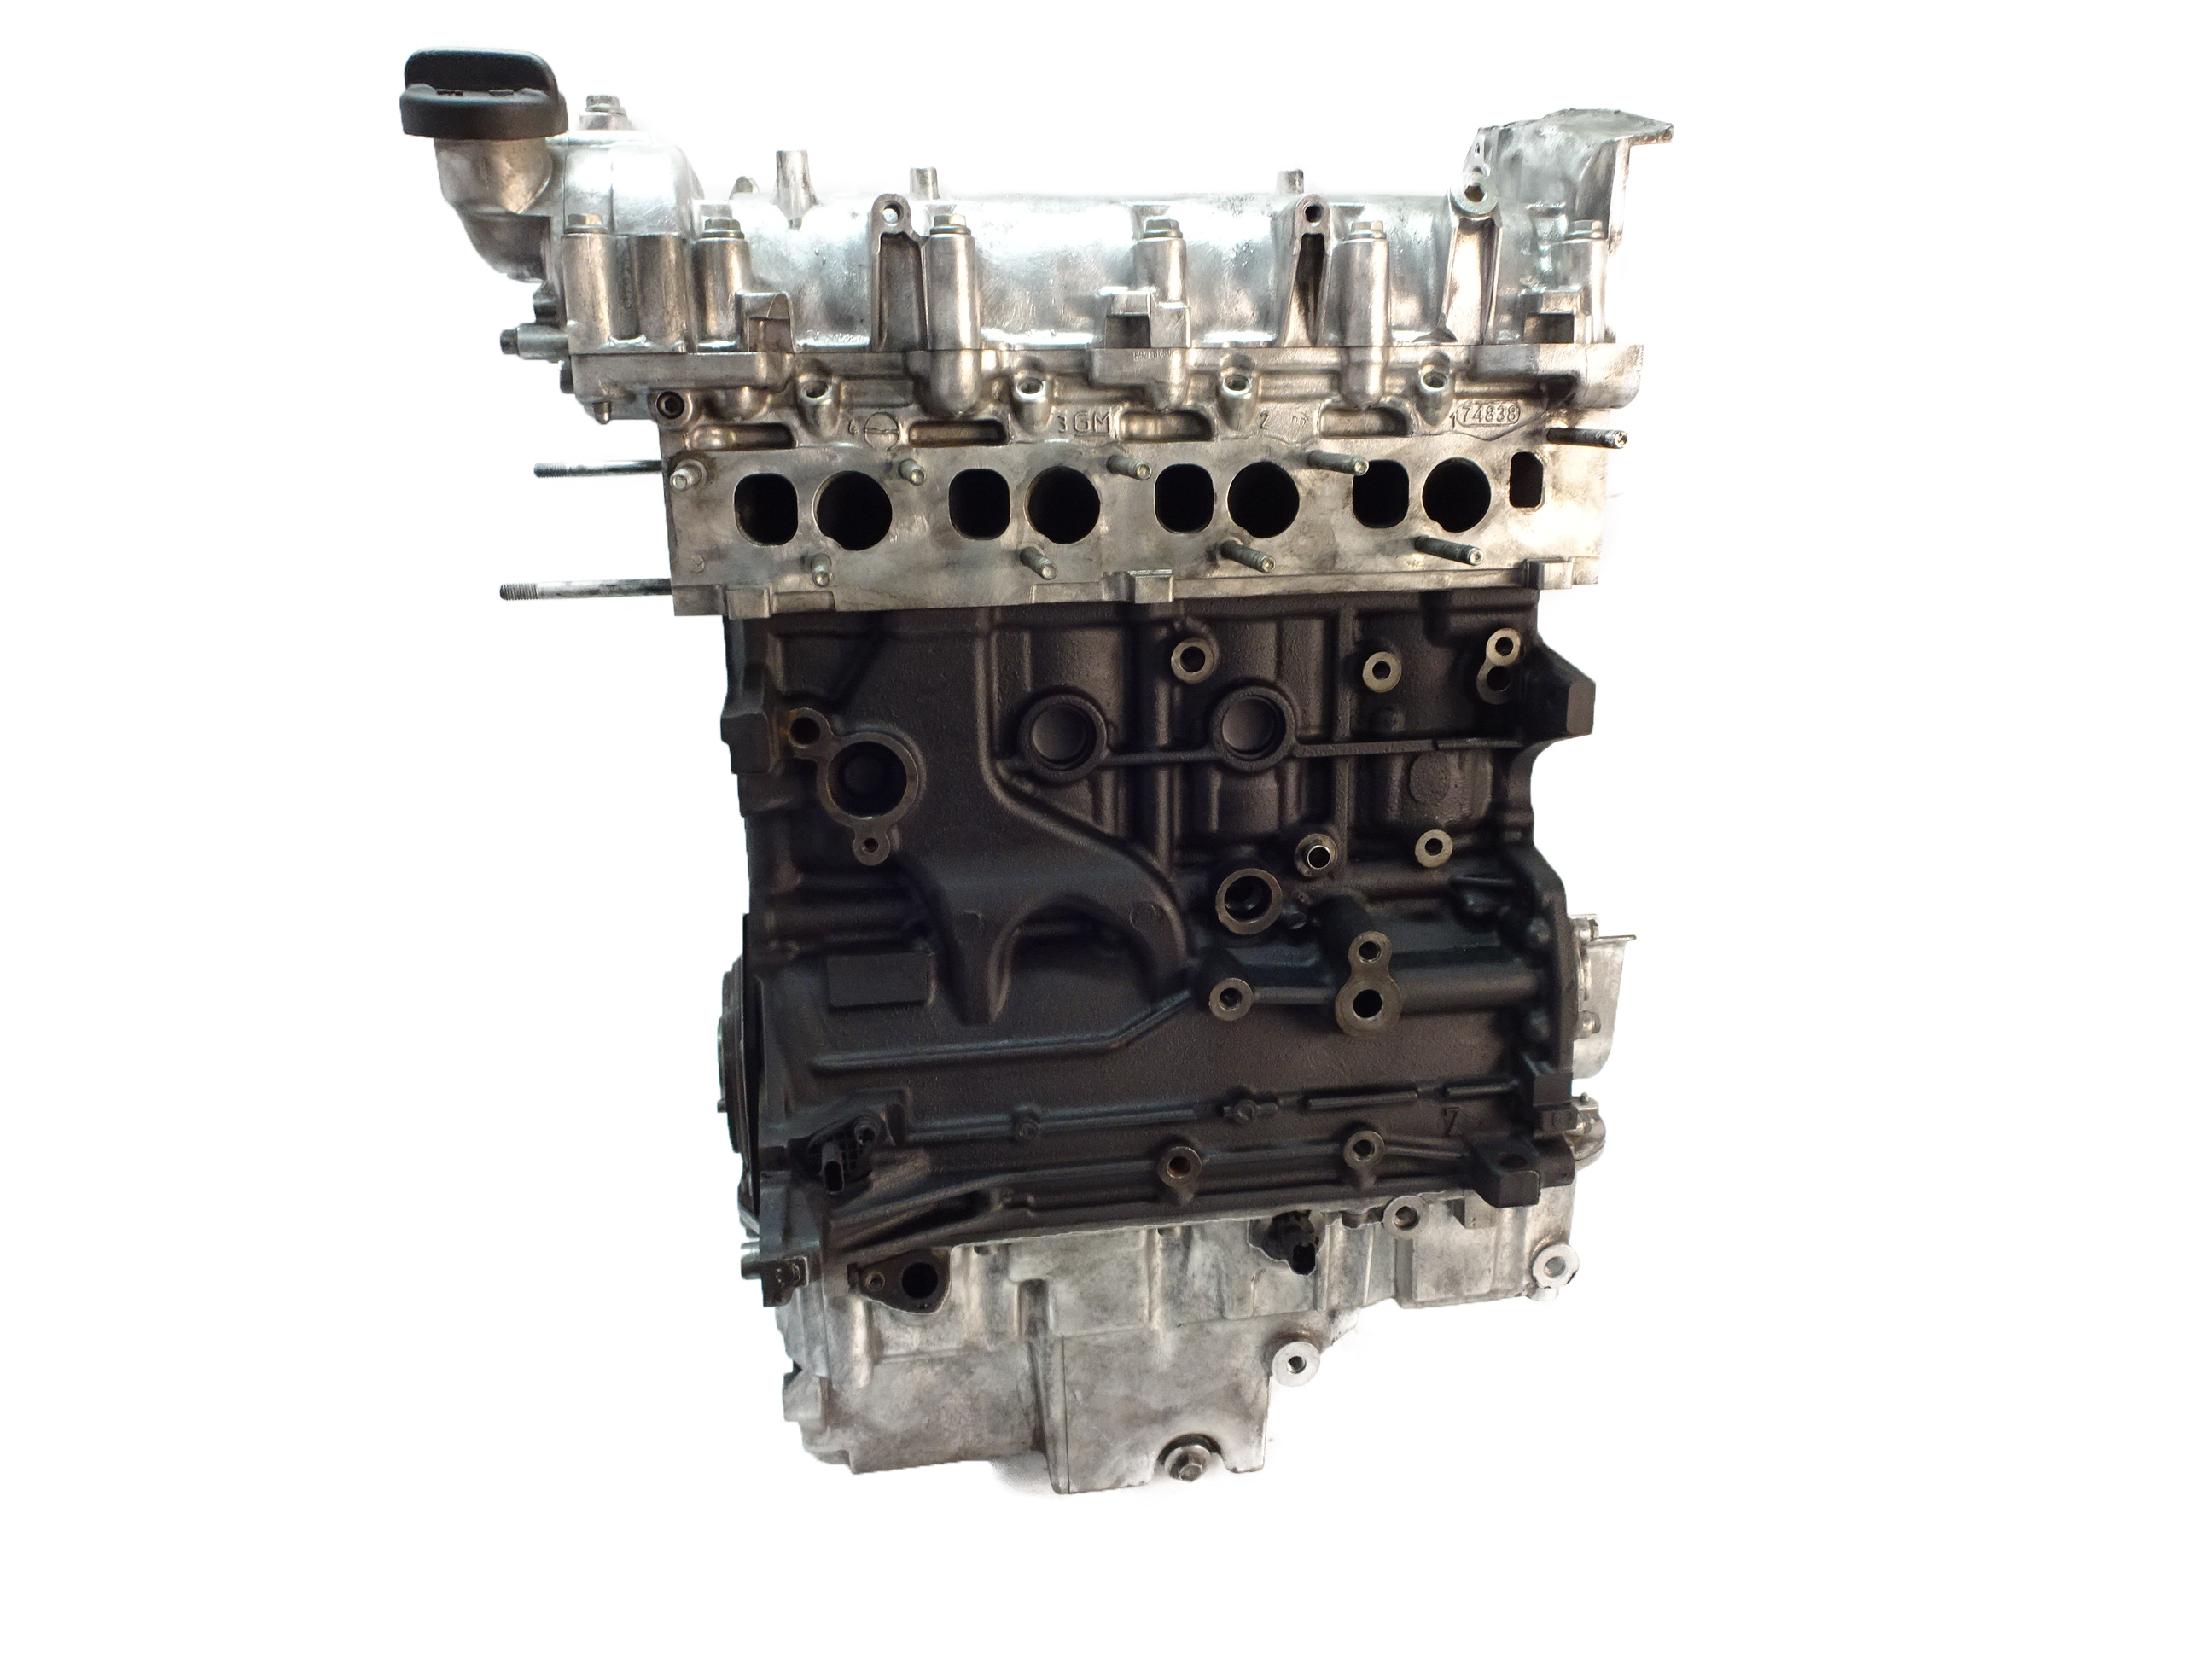 Motor Opel Saab Astra Cascada W13 Insignia Zafira 9-5 2,0 CDTI A20DTH